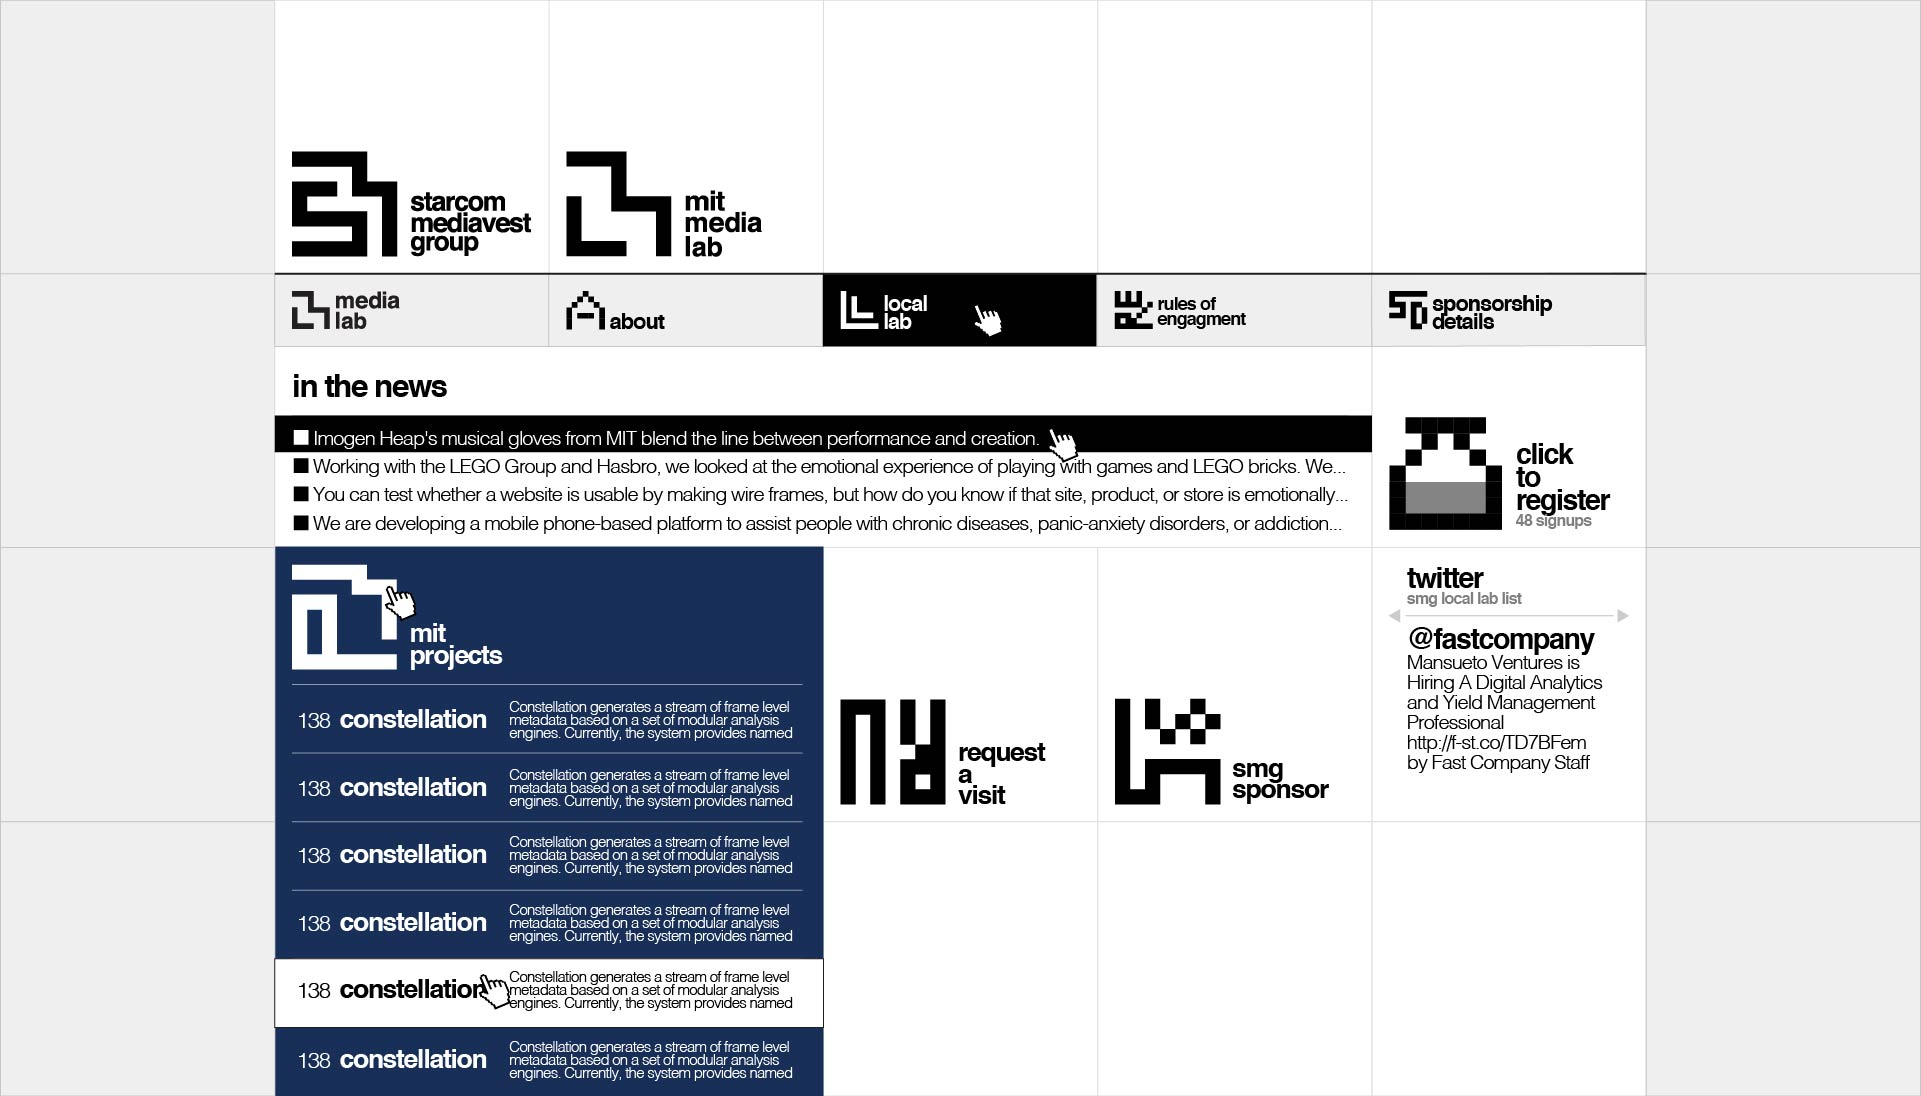 SMG-MIT_Media_Lab_-_Site_Redesign_(03.24.2015_1532_SS)-02.jpg